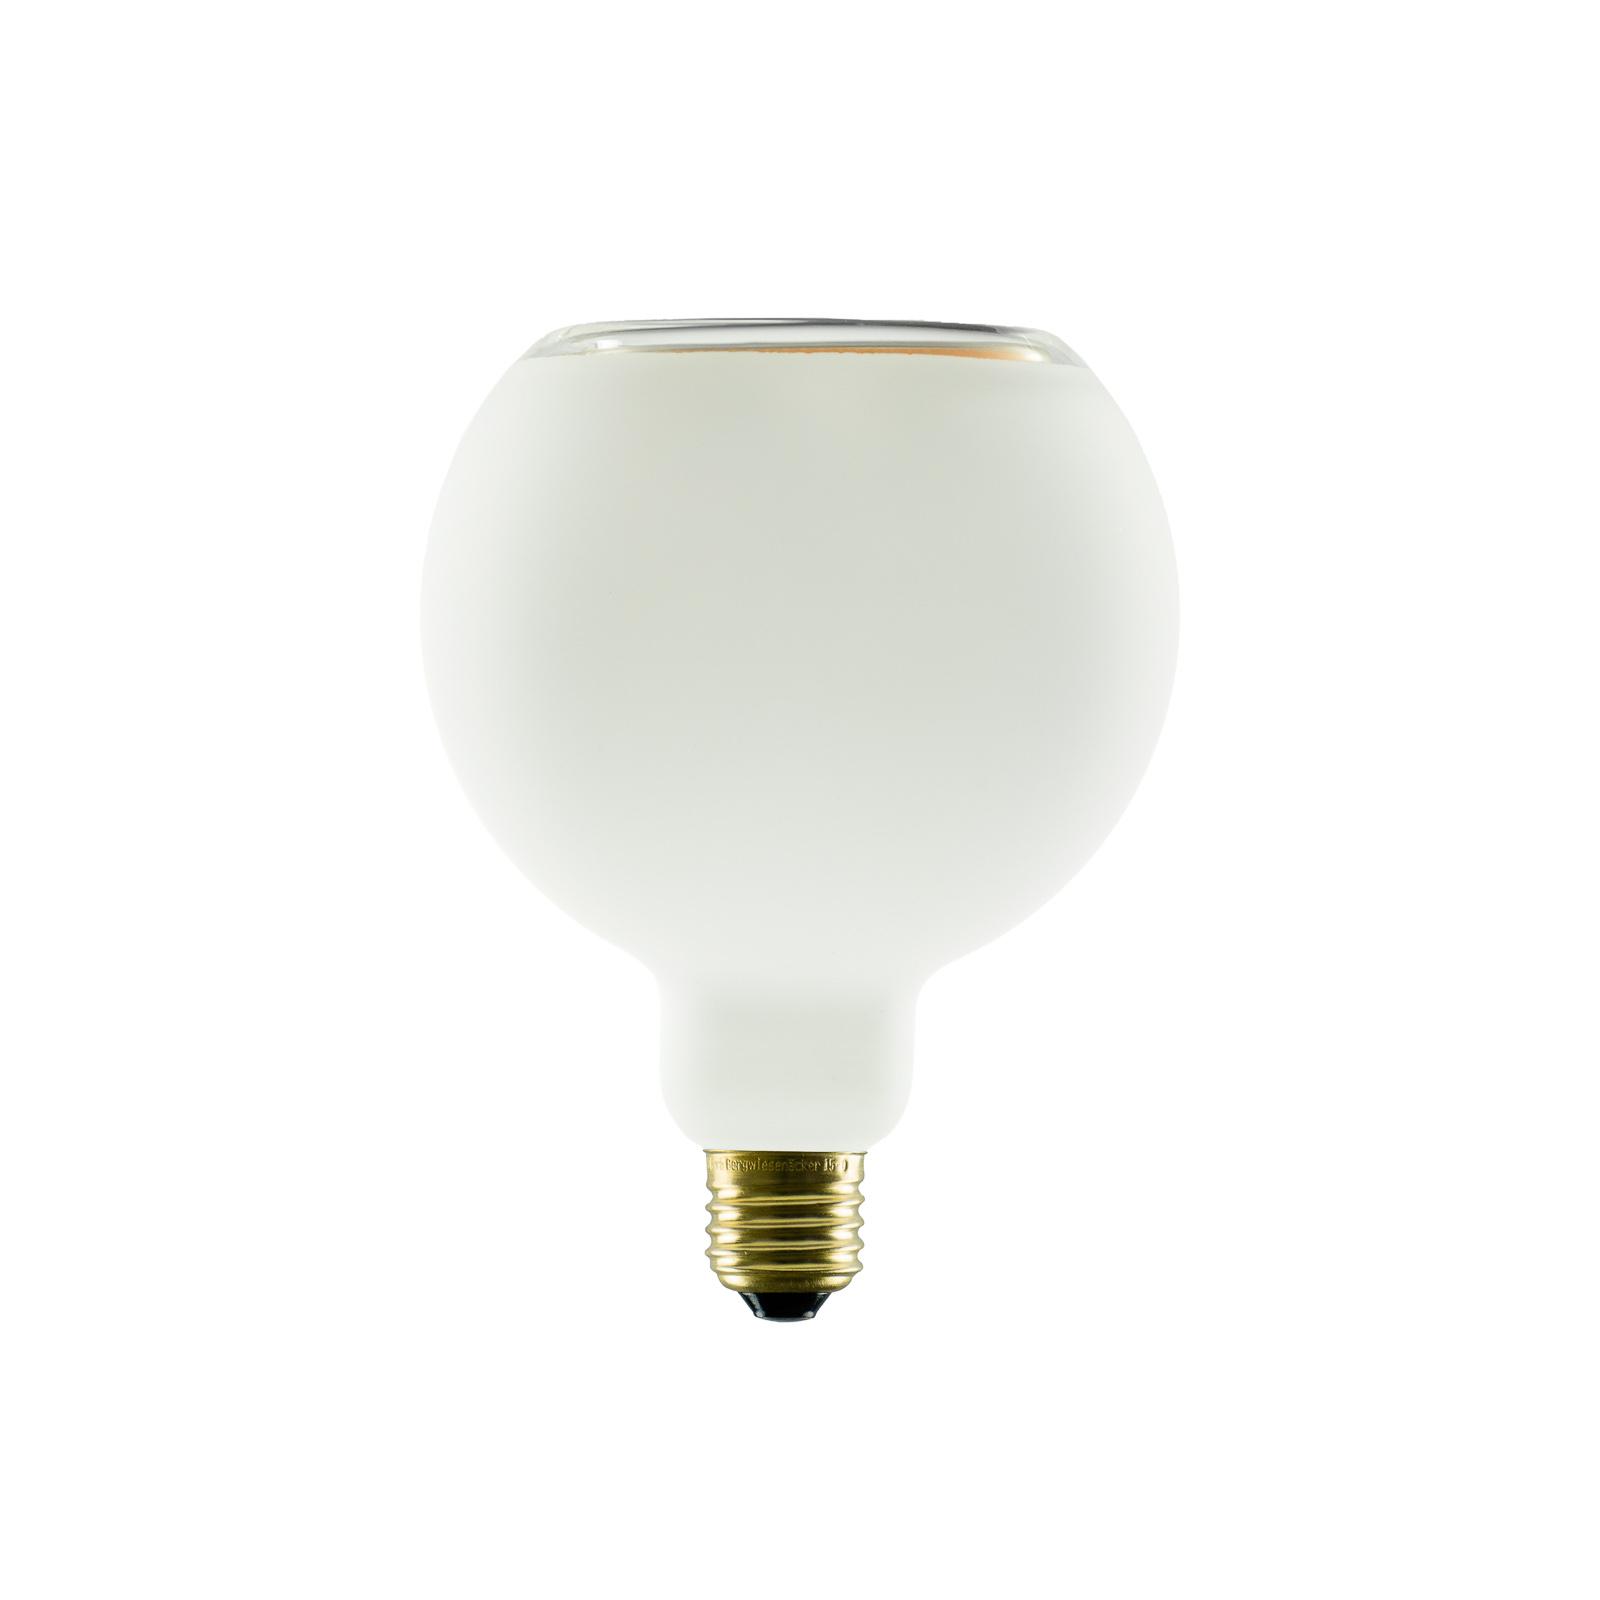 SEGULA LED-Floating-Globelampe G125 E27 8W opal